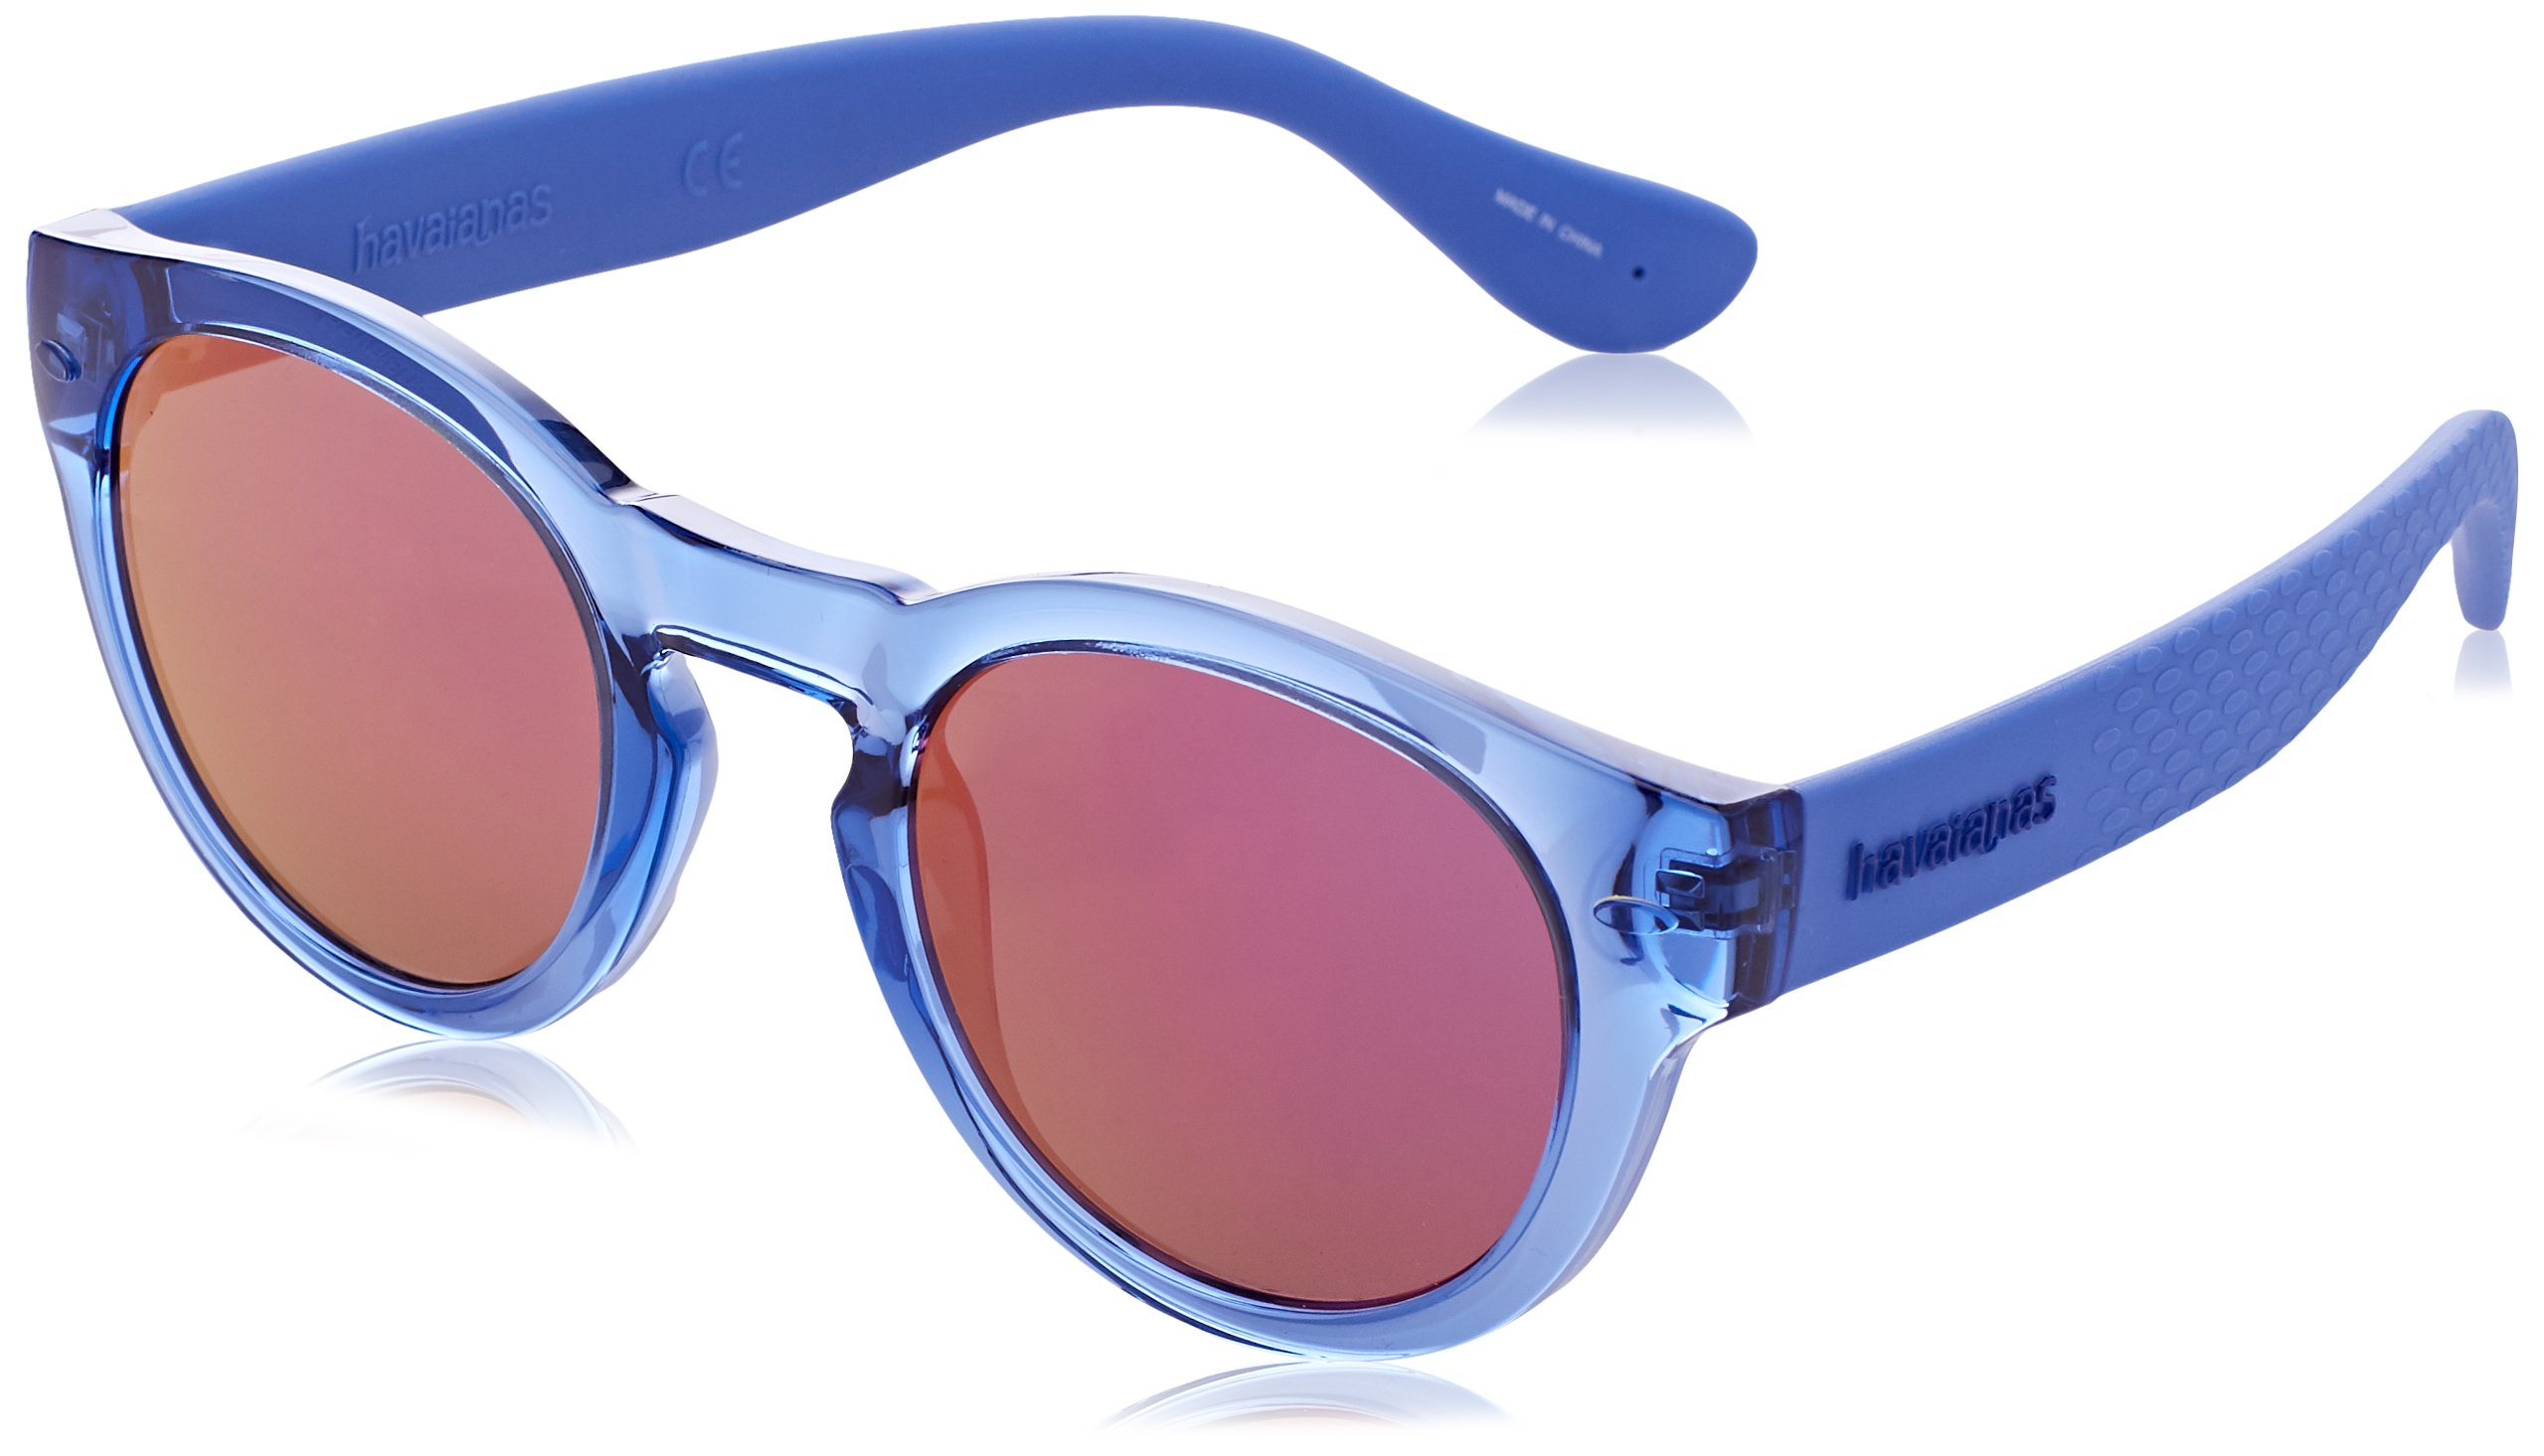 Havaianas Trancoso/m Round Sunglasses, Blu Bluet, 49 mm by Havaianas